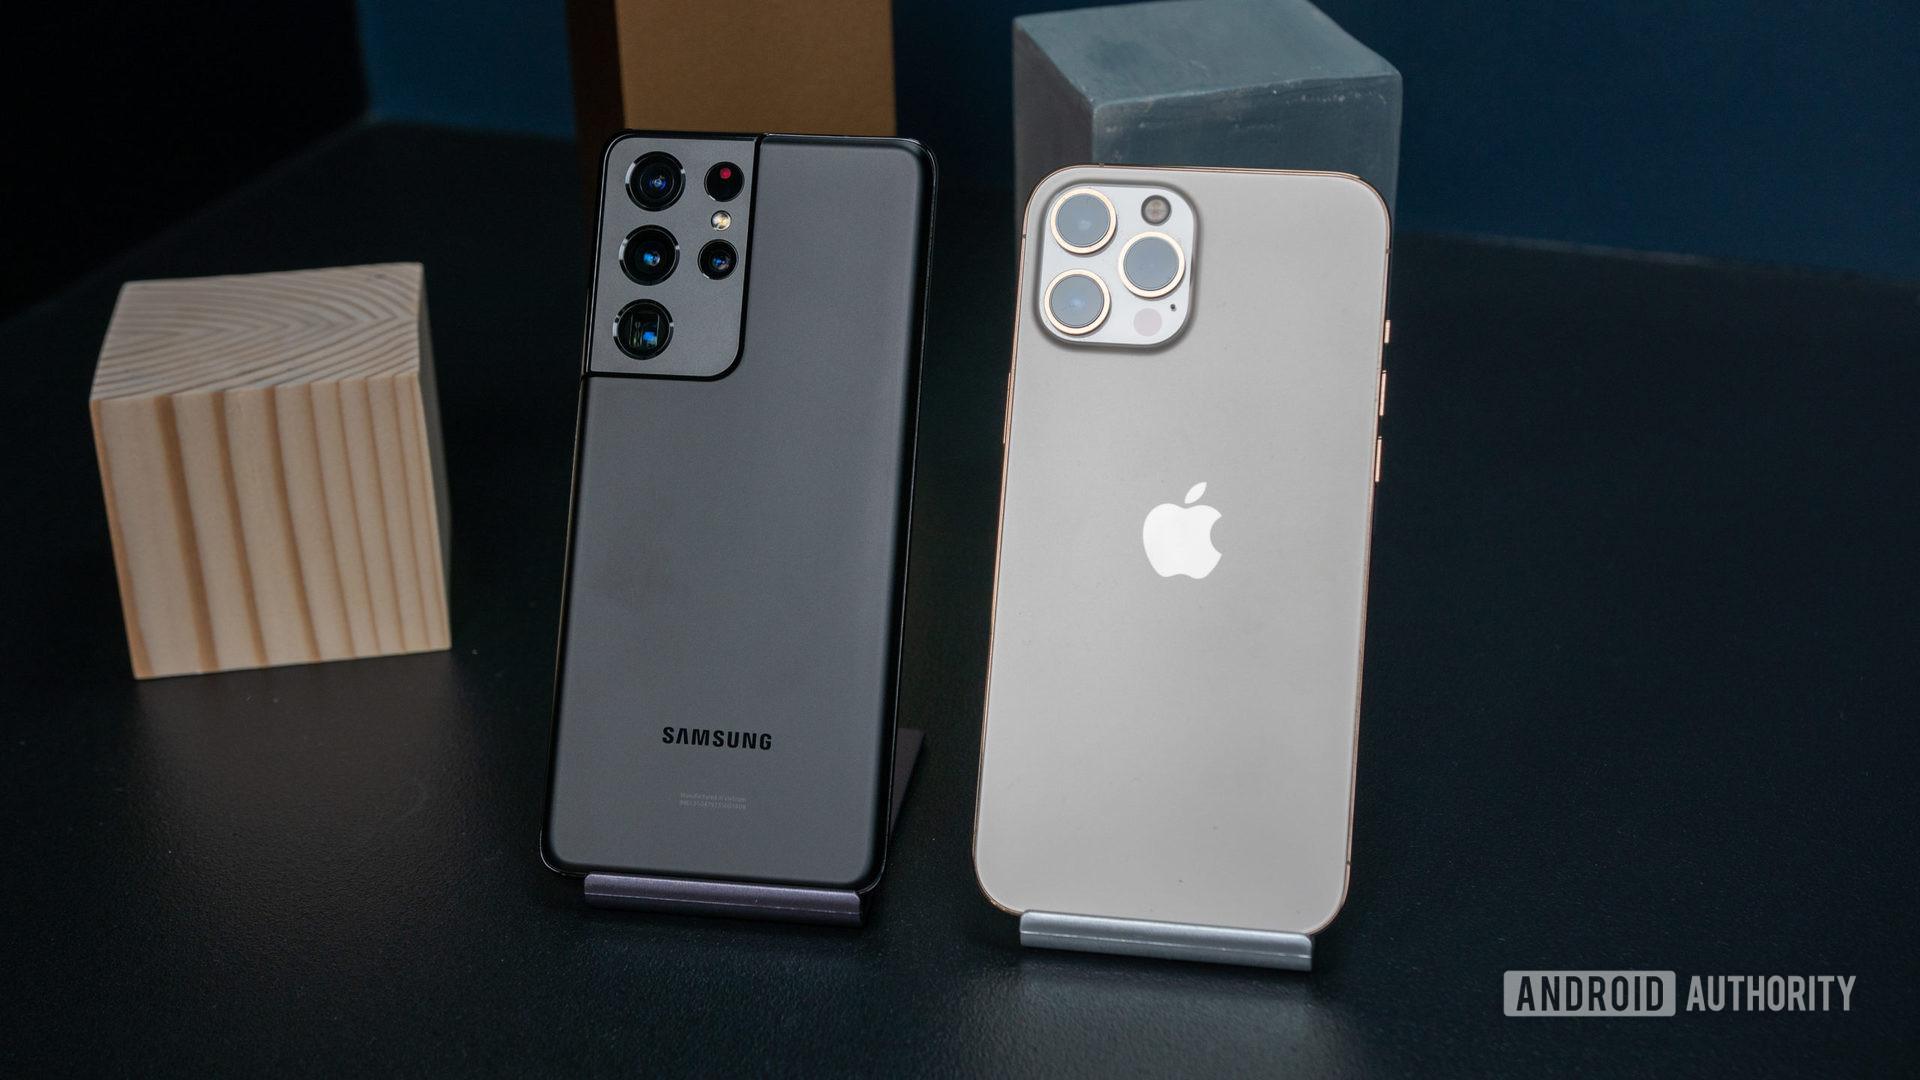 Samsung Galaxy S21 Ultra vs iPhone 12 Pro Max 2